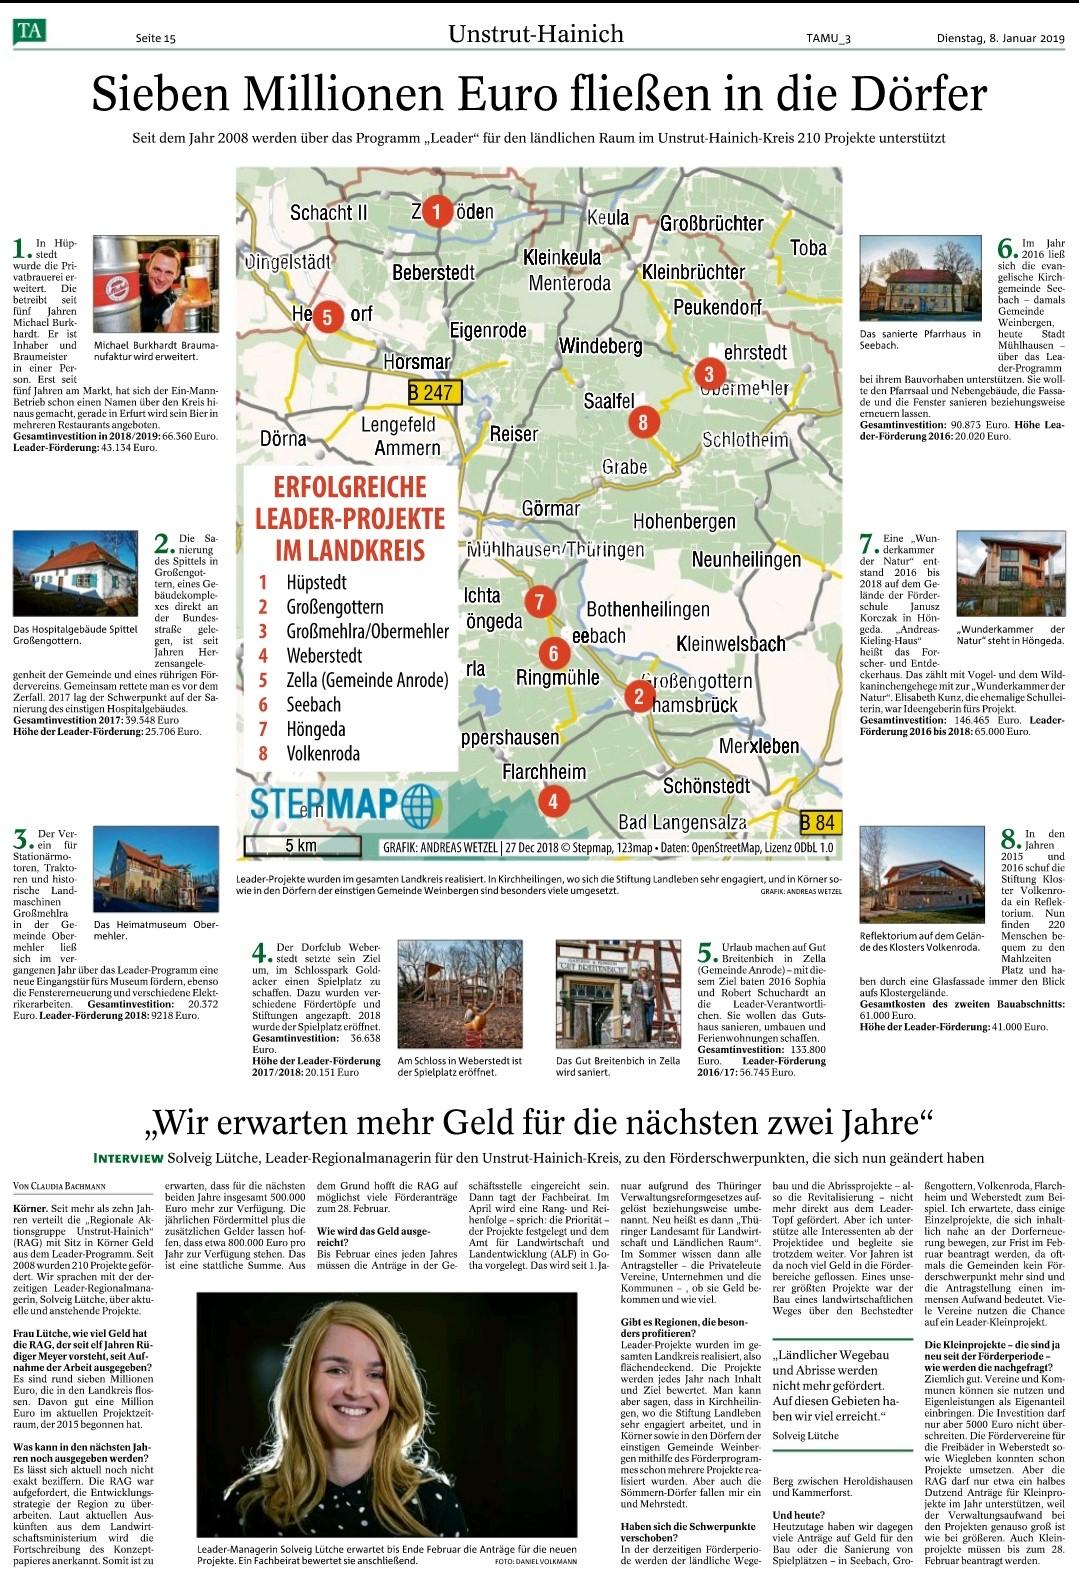 2019-01-08 Sieben Millionen Euro fließen in Dörfer TA.jpg